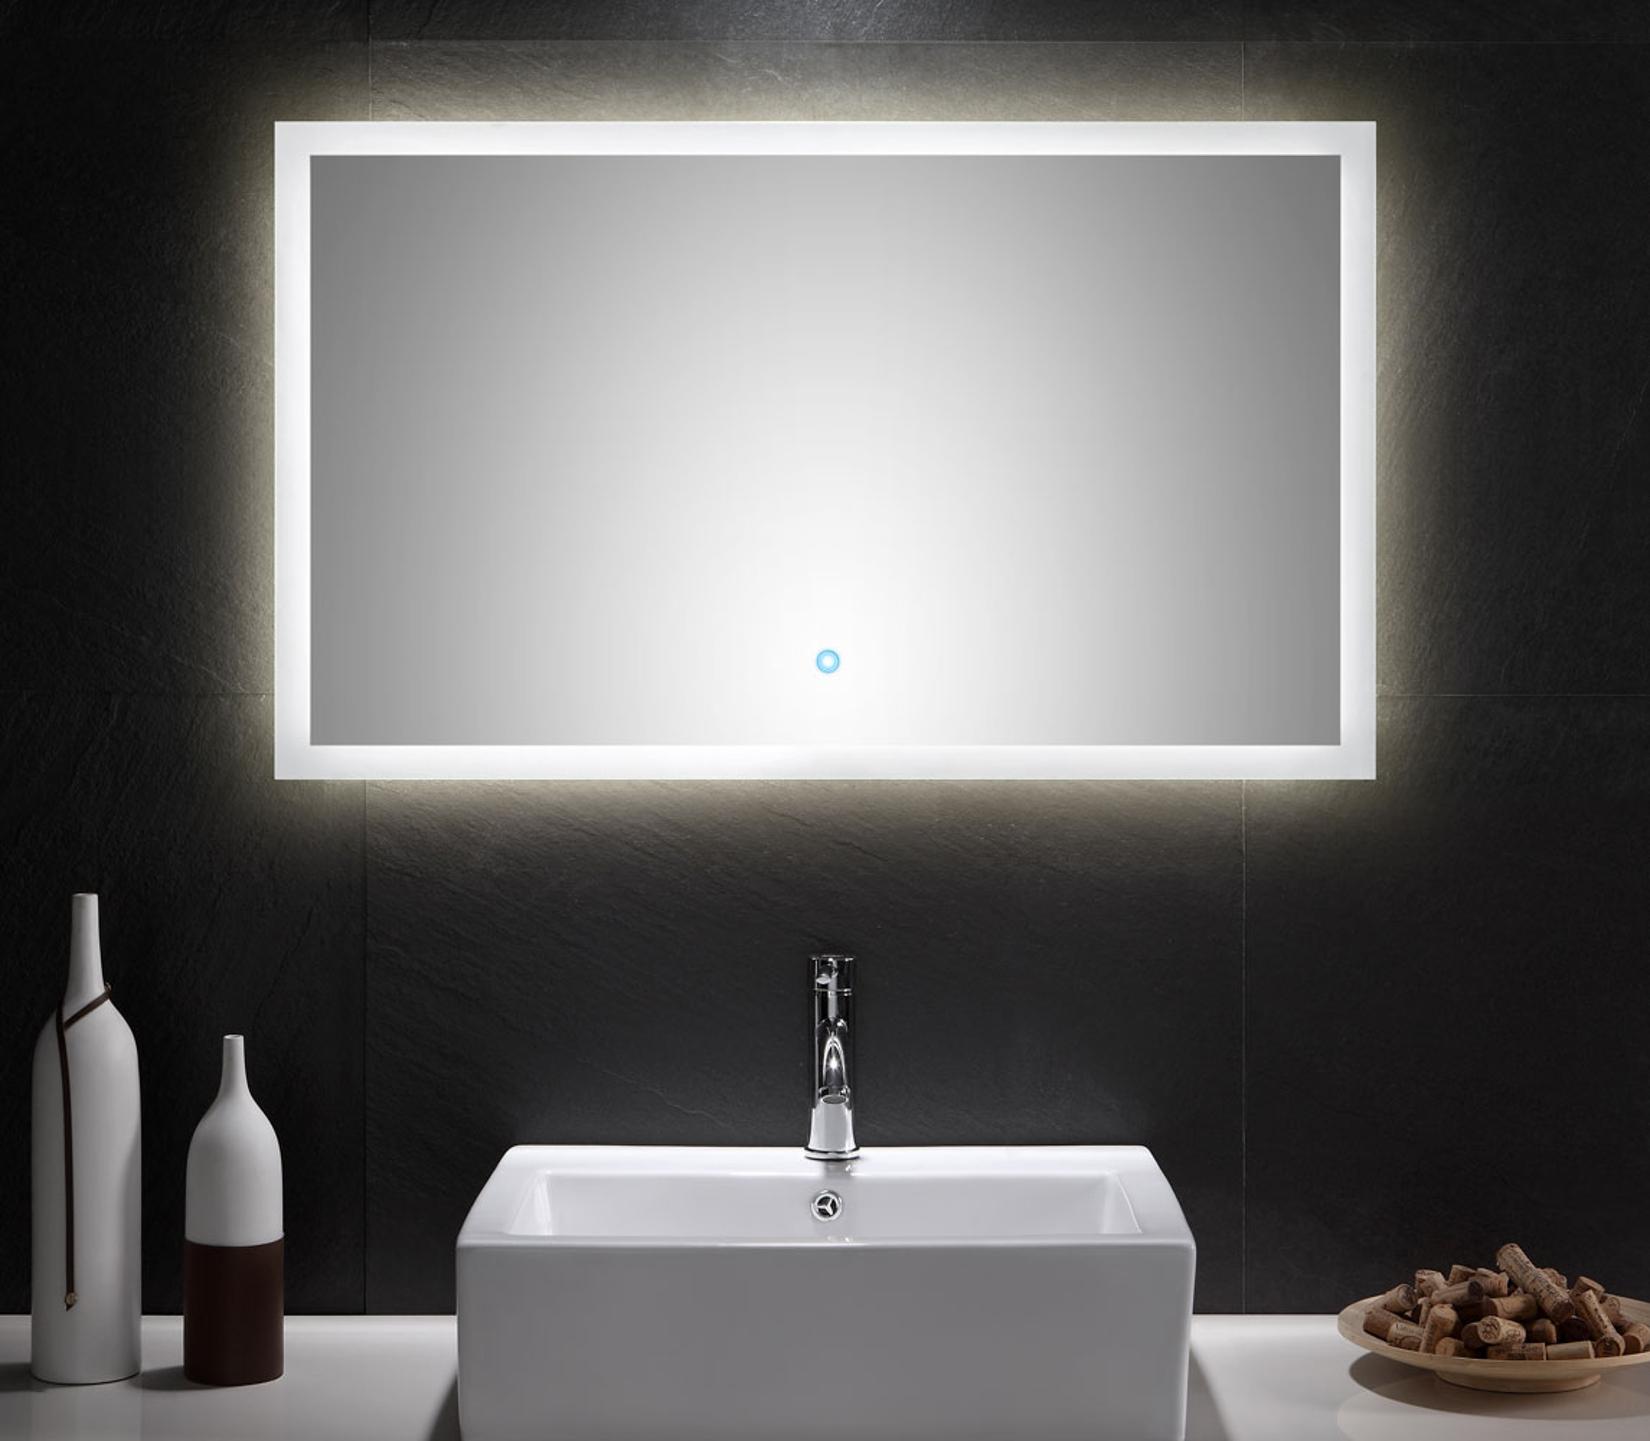 bad spiegel levia mit led touch steuerung 100 cm breit. Black Bedroom Furniture Sets. Home Design Ideas